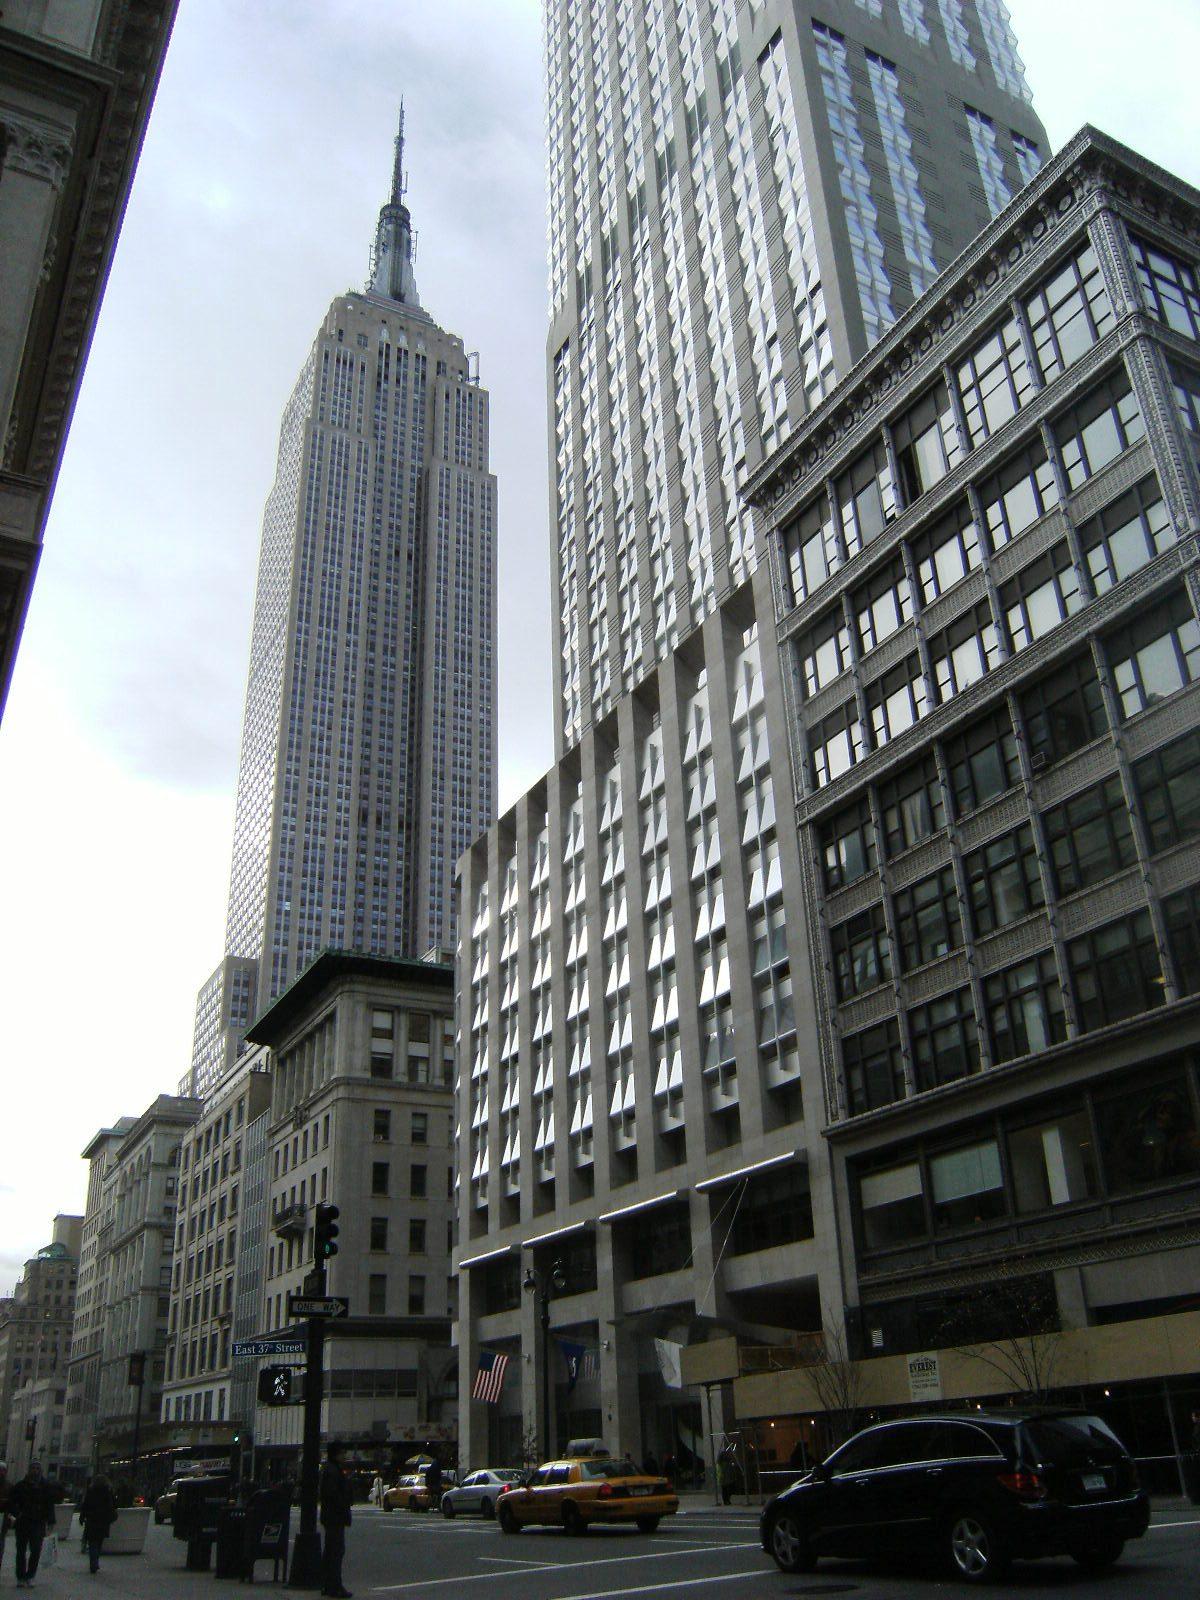 Umbria Holiday Rentals NYC New York Public